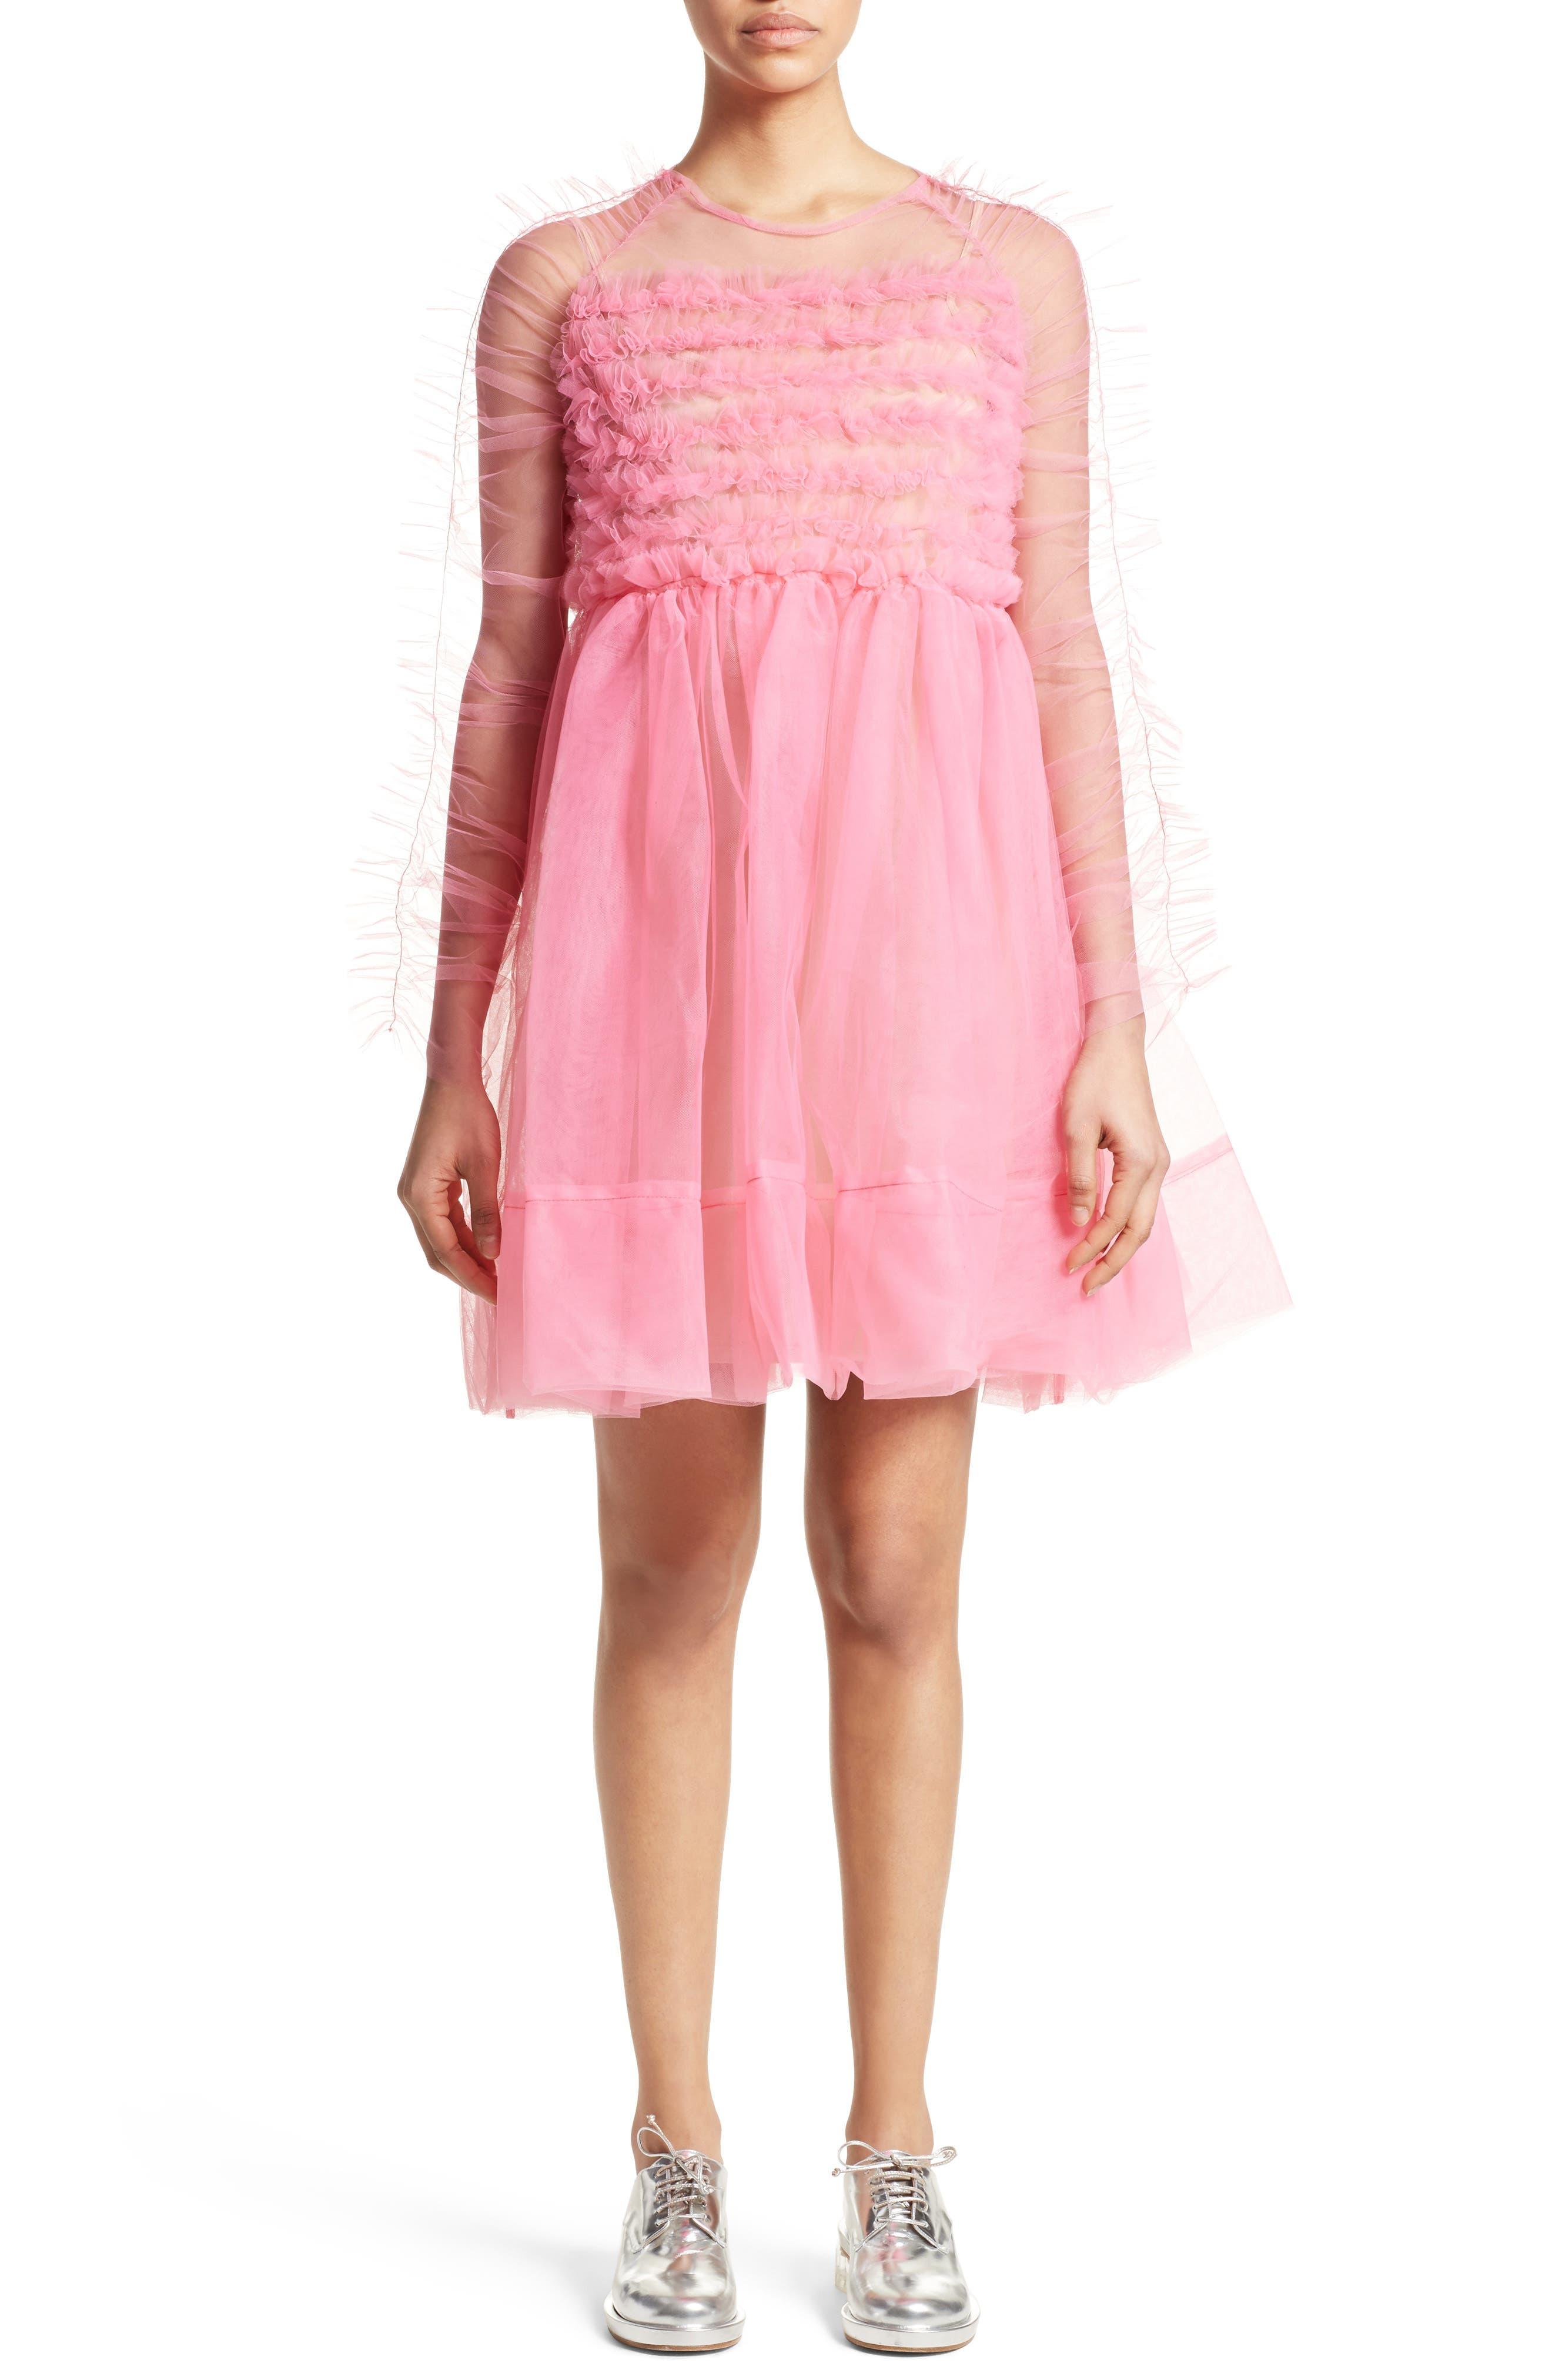 Molly Goddard Funky Tulle Dress